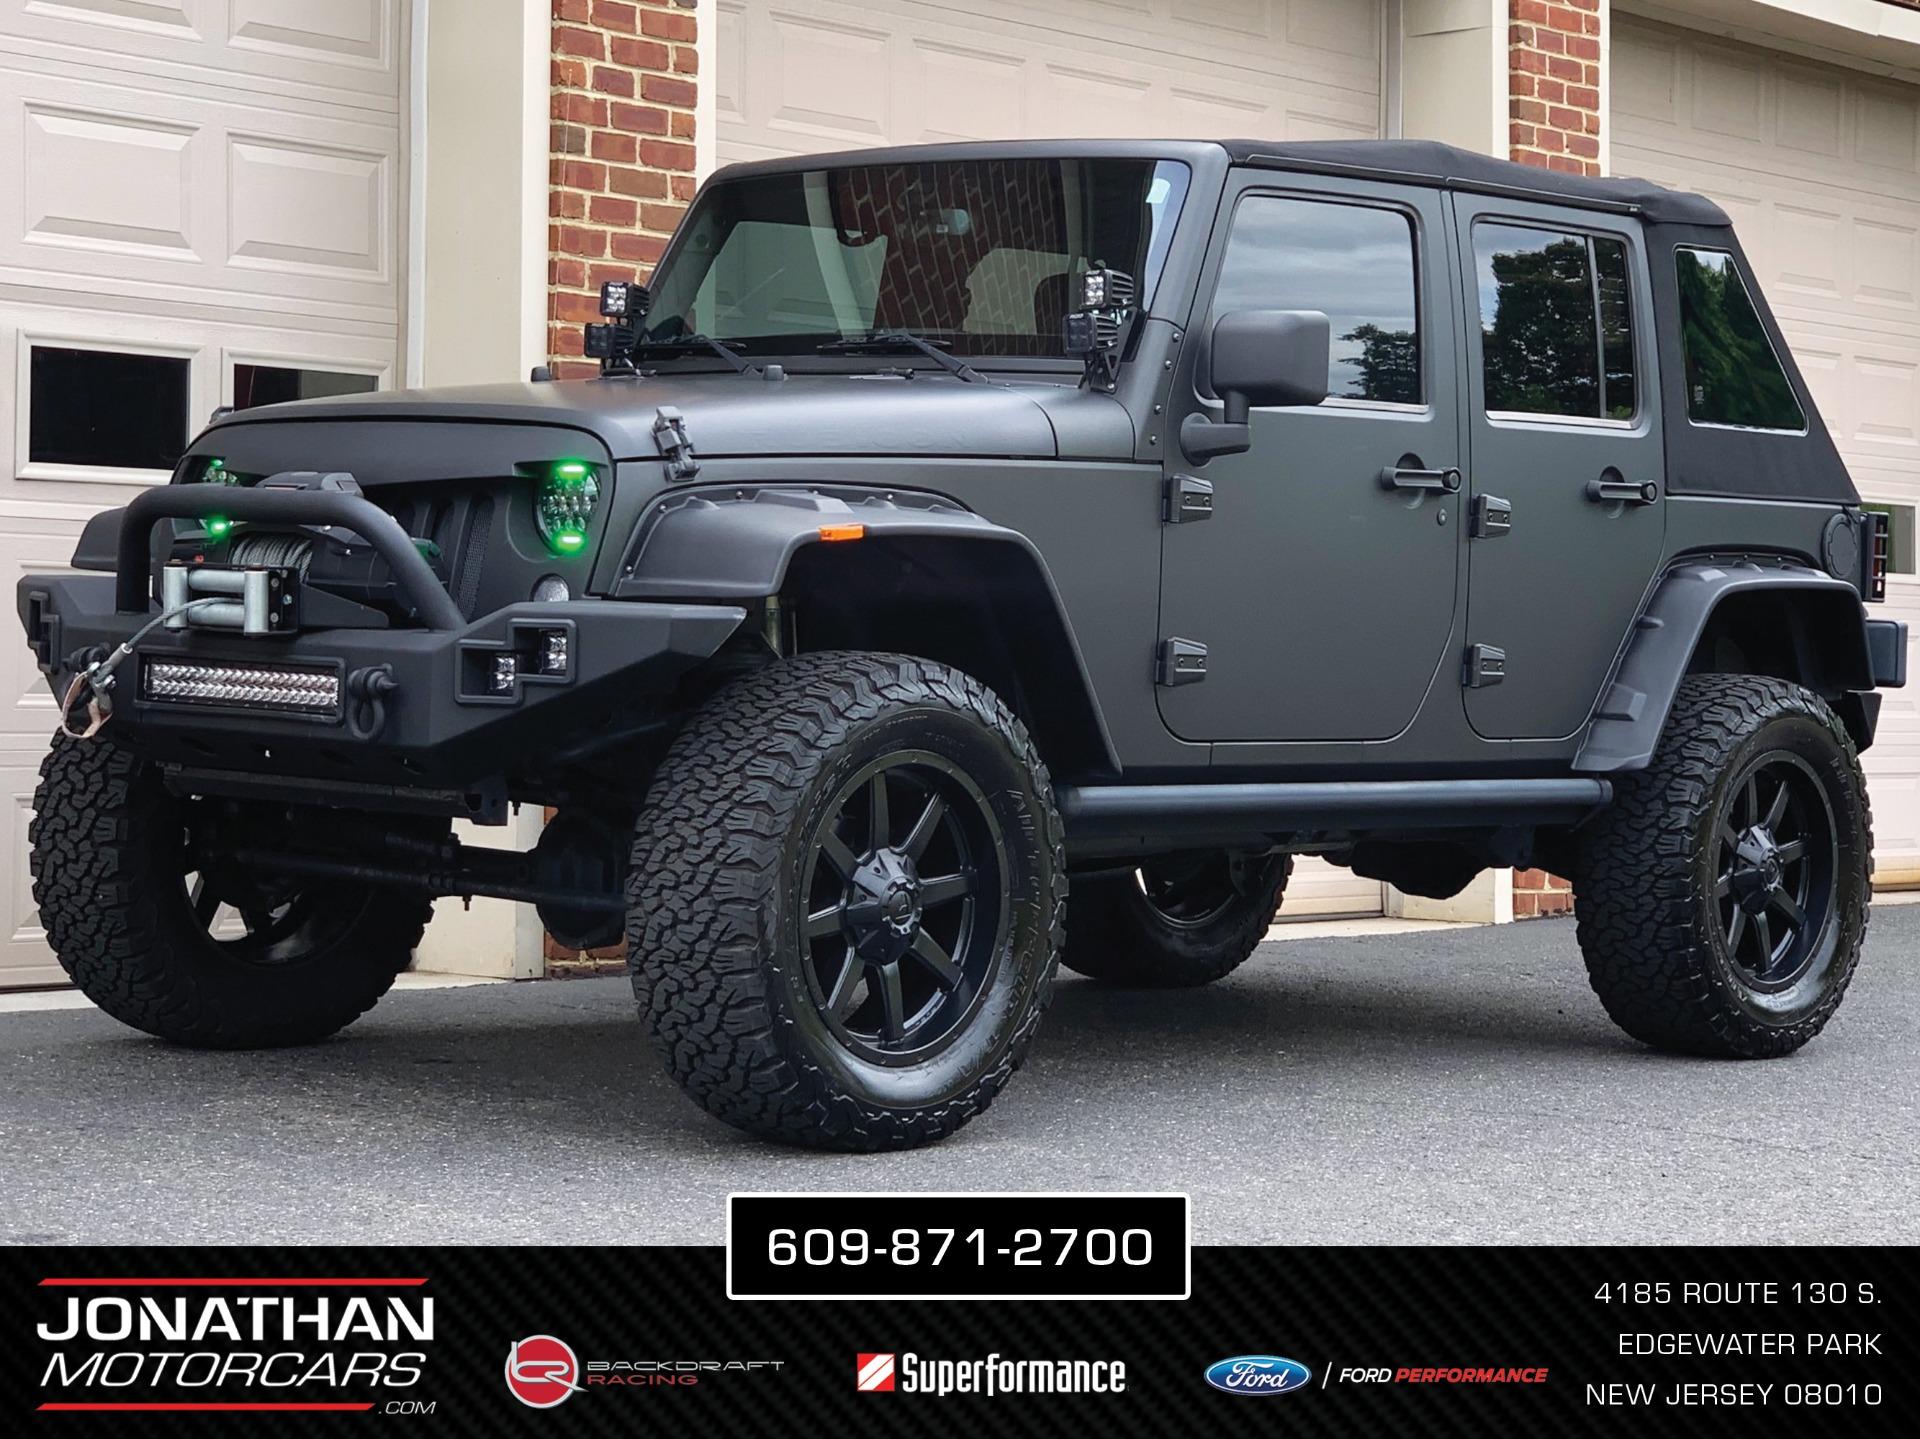 Used 2015 Jeep Wrangler Unlimited Rubicon JMC Custom | Edgewater Park, NJ